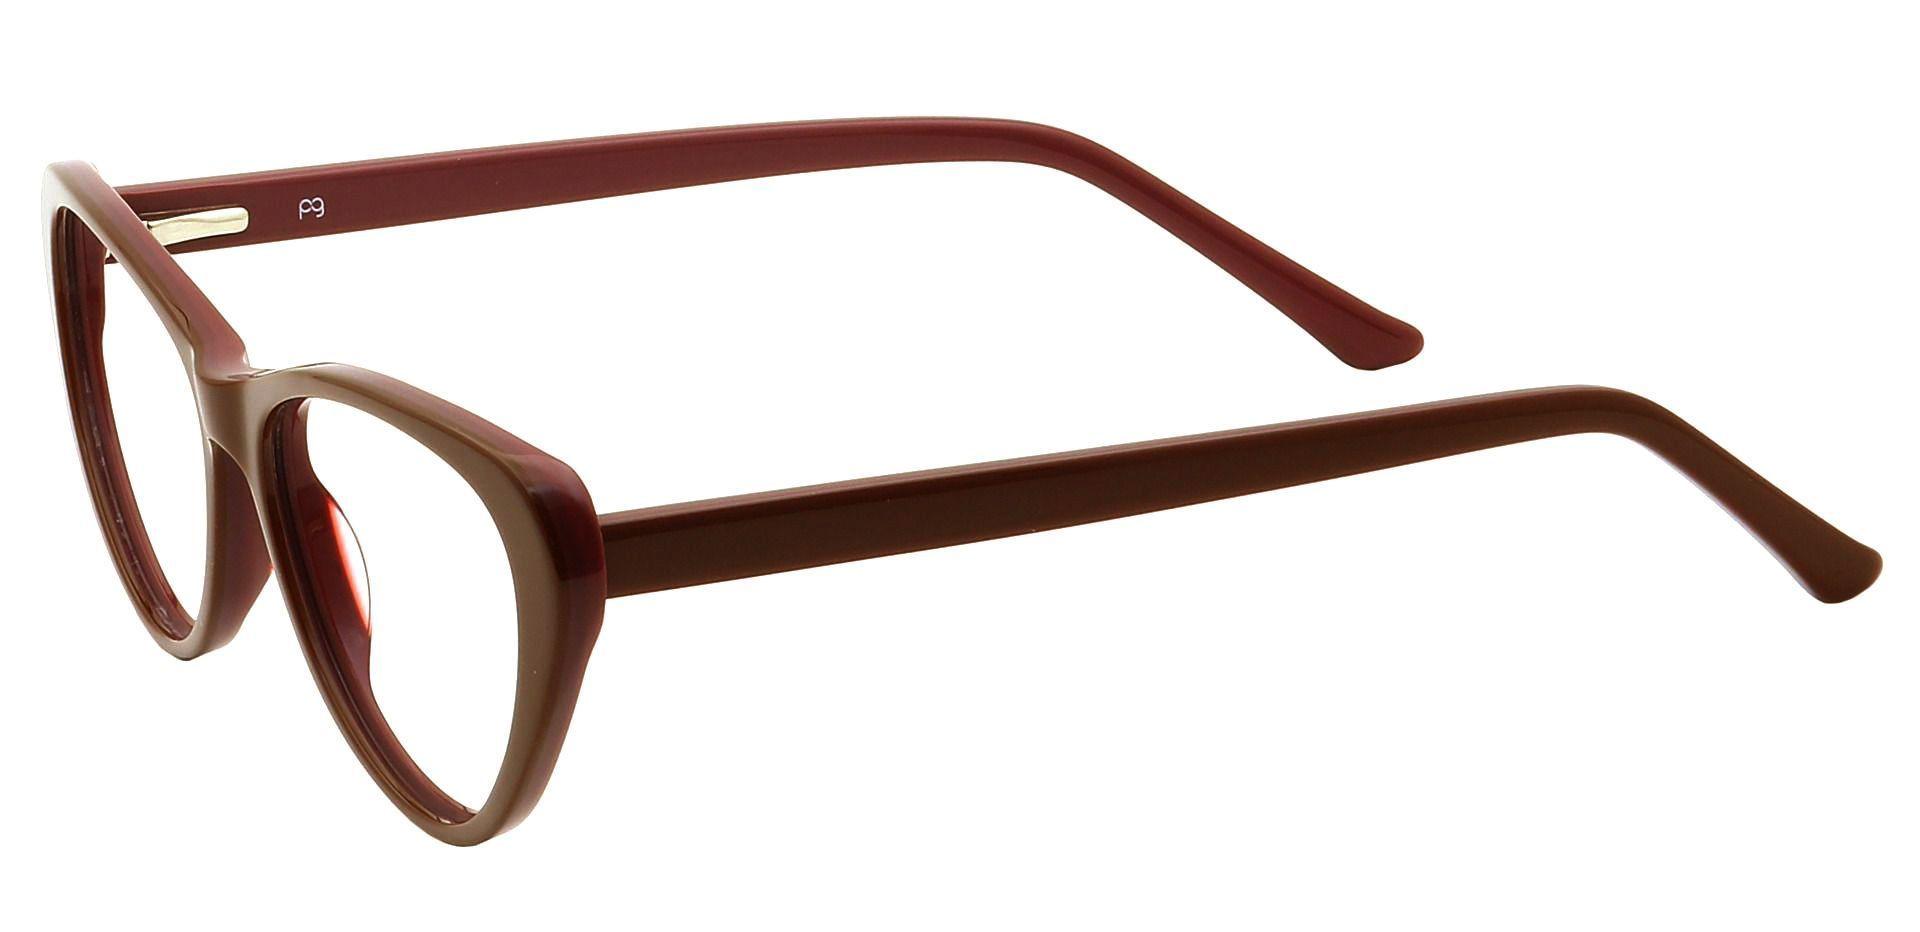 Lola Cat-Eye Reading Glasses - Brown